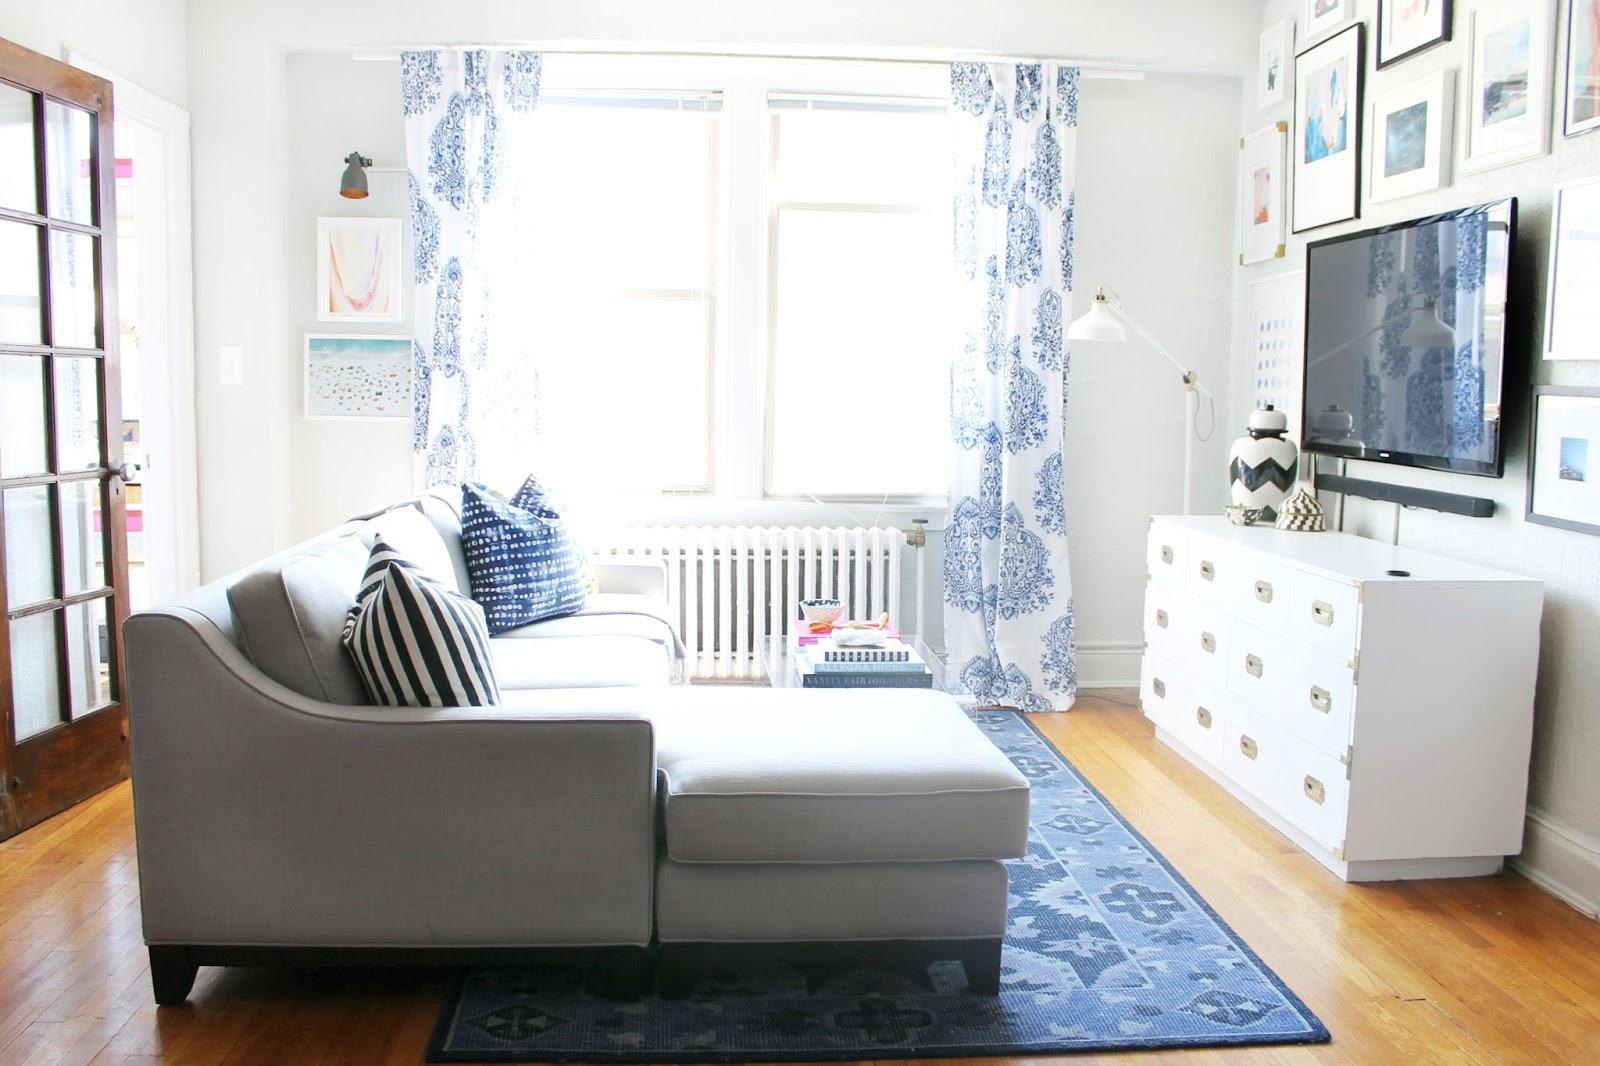 Keegan Sofa Keegan 90 2 Piece Fabric Sectional Sofa ...